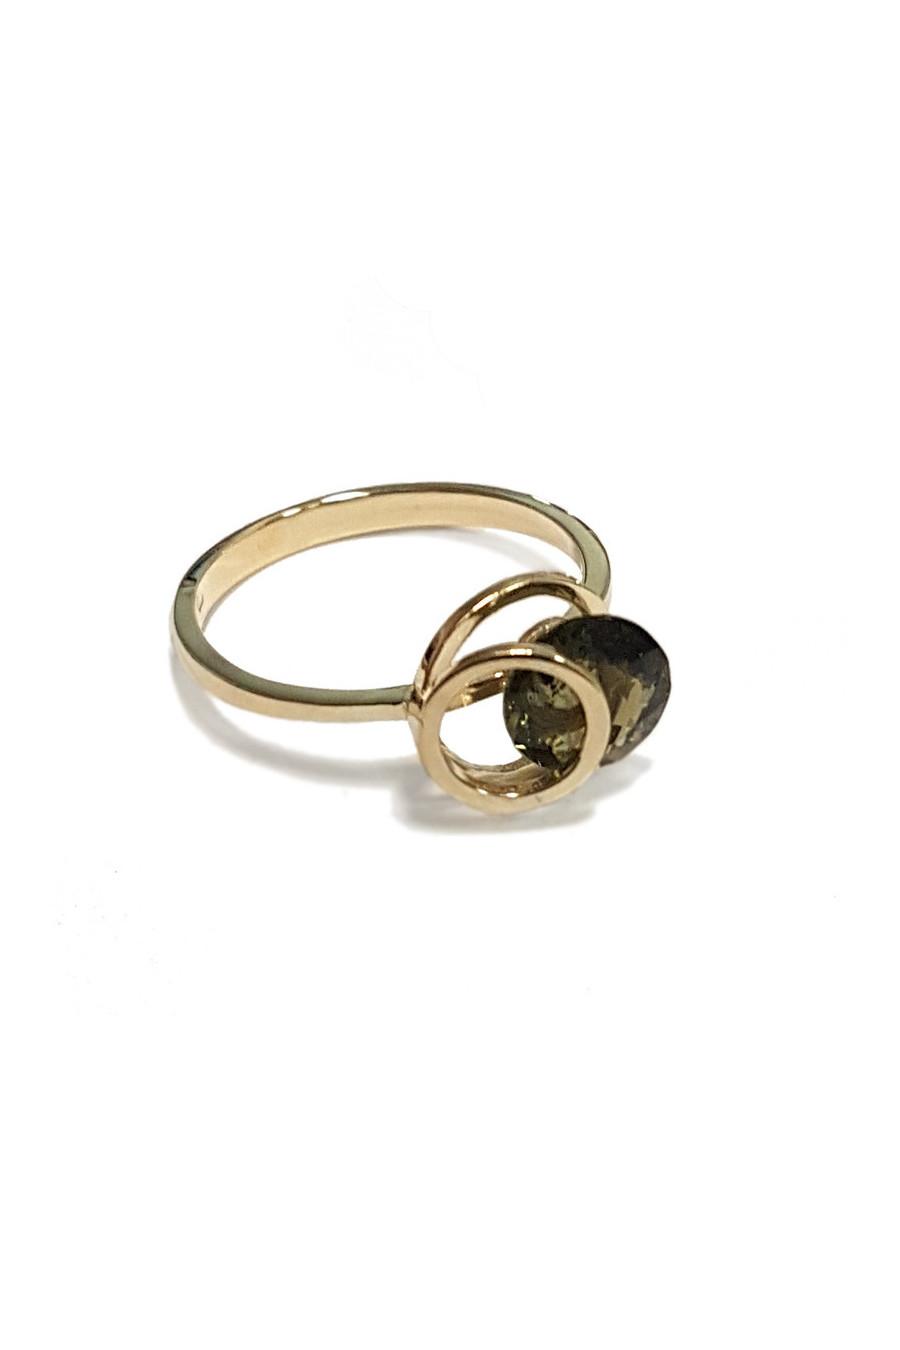 Gold ring with moldavite